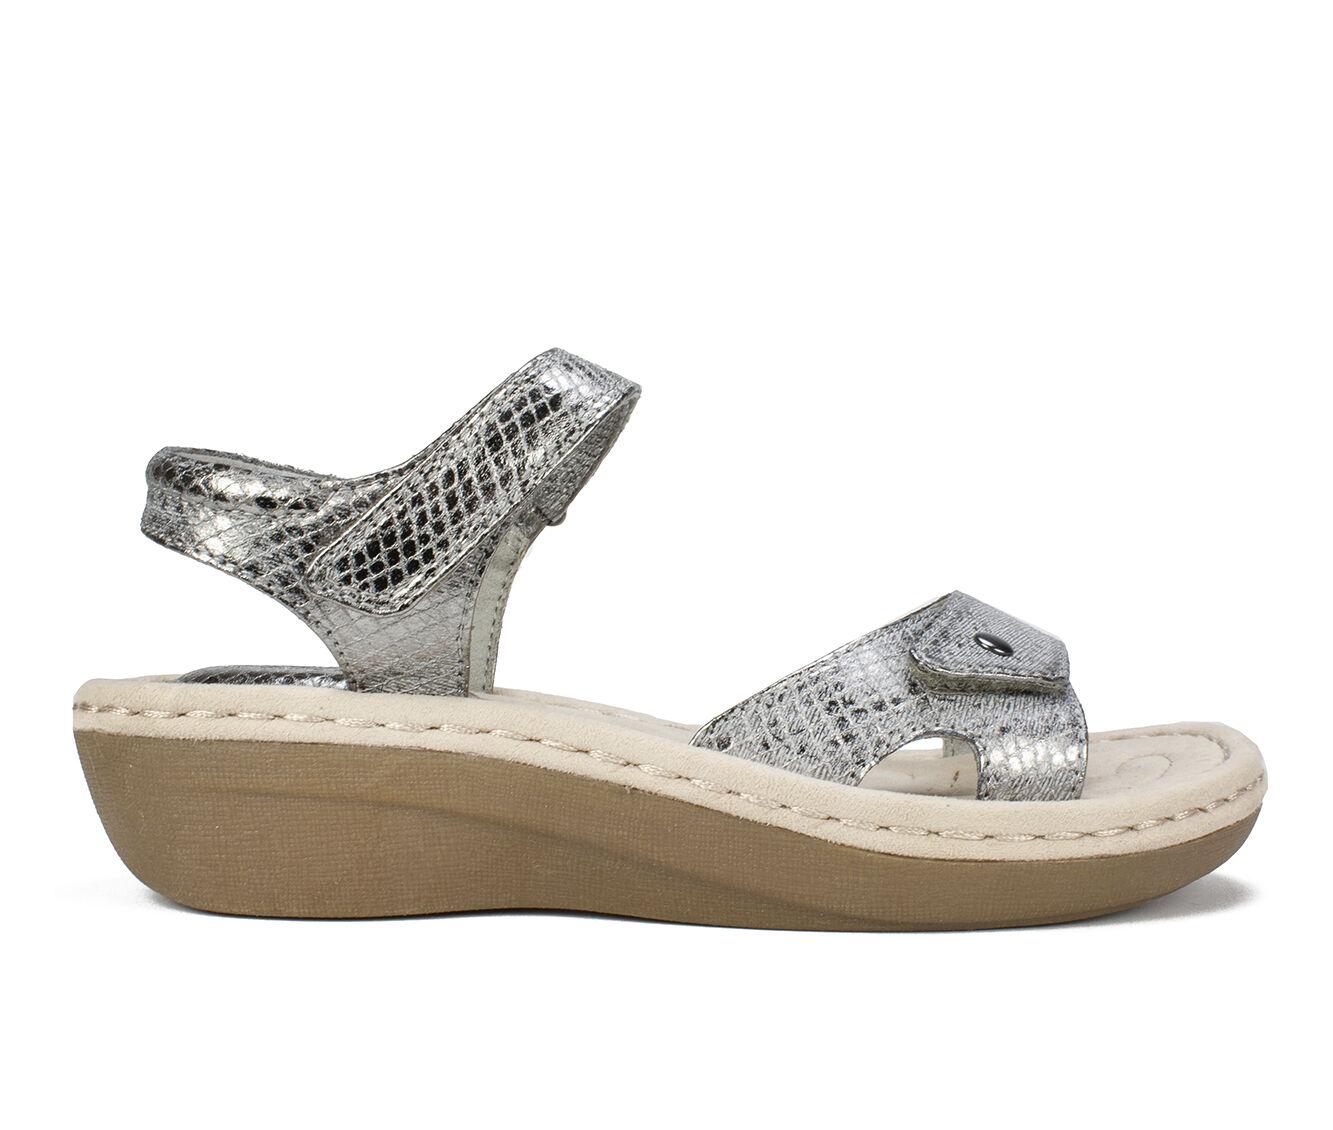 uk shoes_kd6616